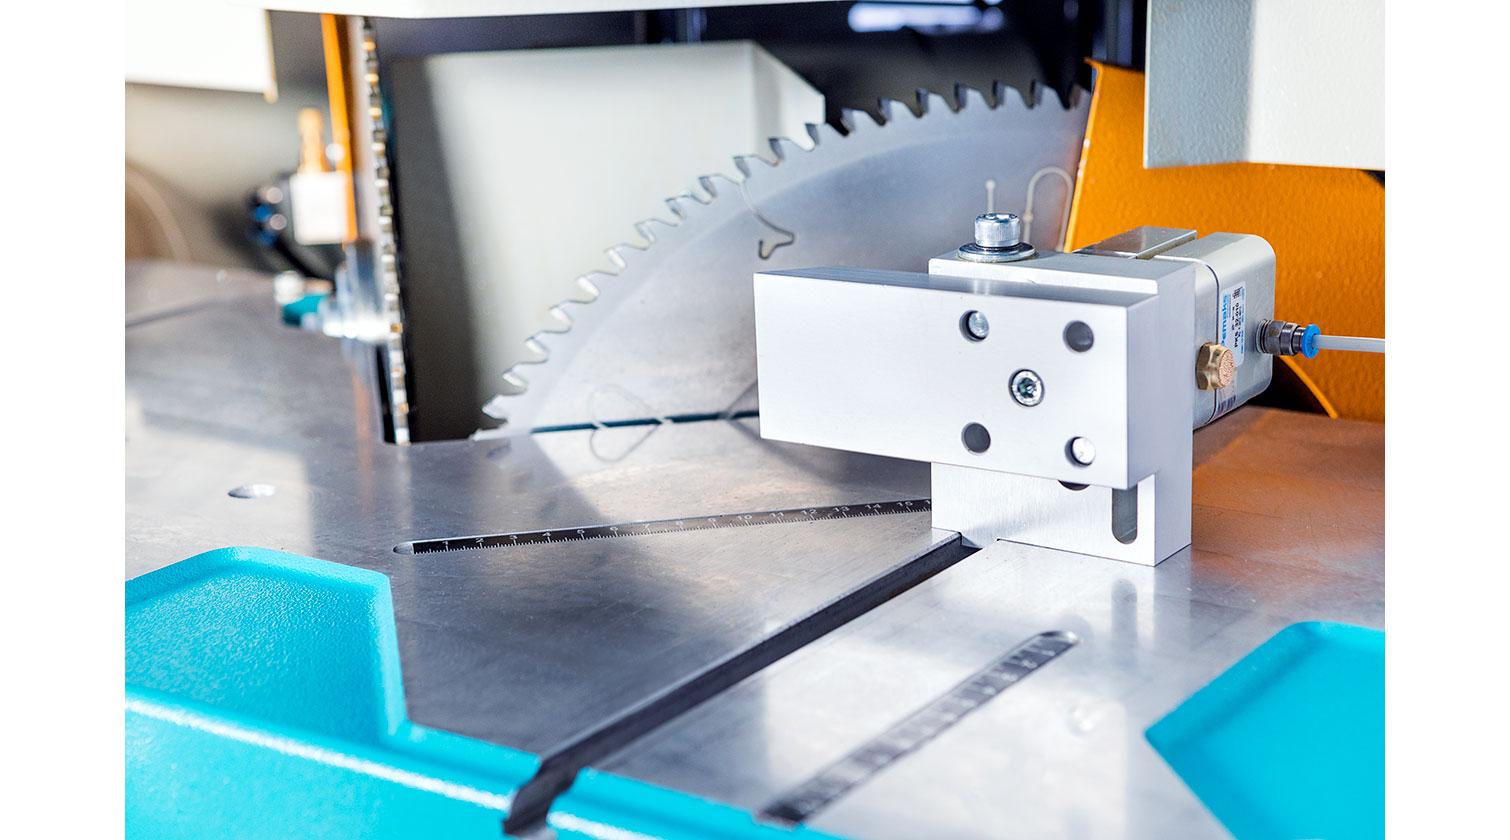 INT aluminum V cut vertical saw Yilmaz VK 420 blades b